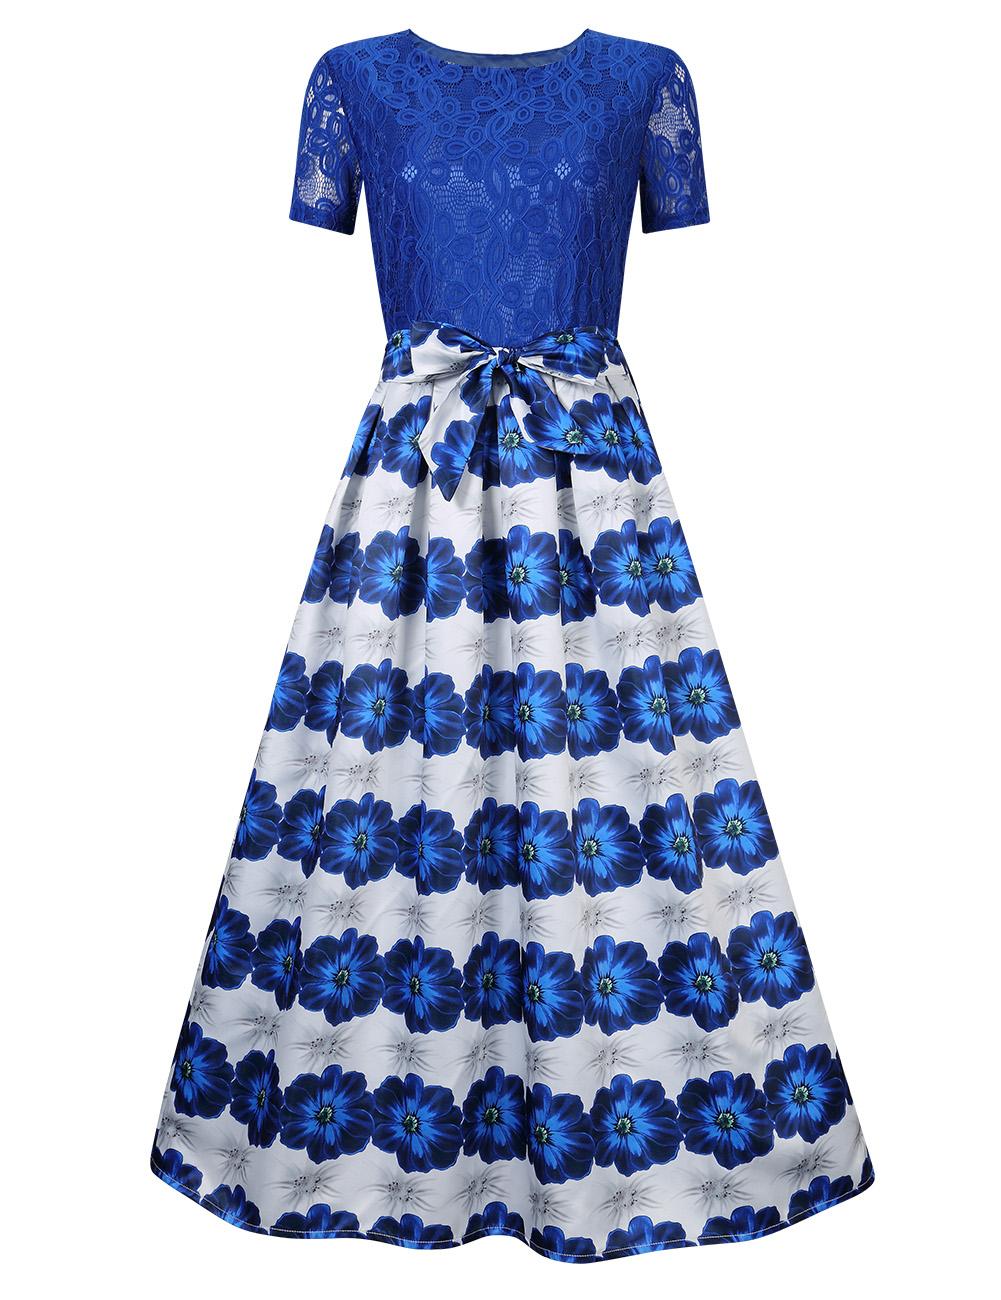 [US Direct] Glorysunshine Women Modest Lace Bowknot A-line Pleated Maxi Dress